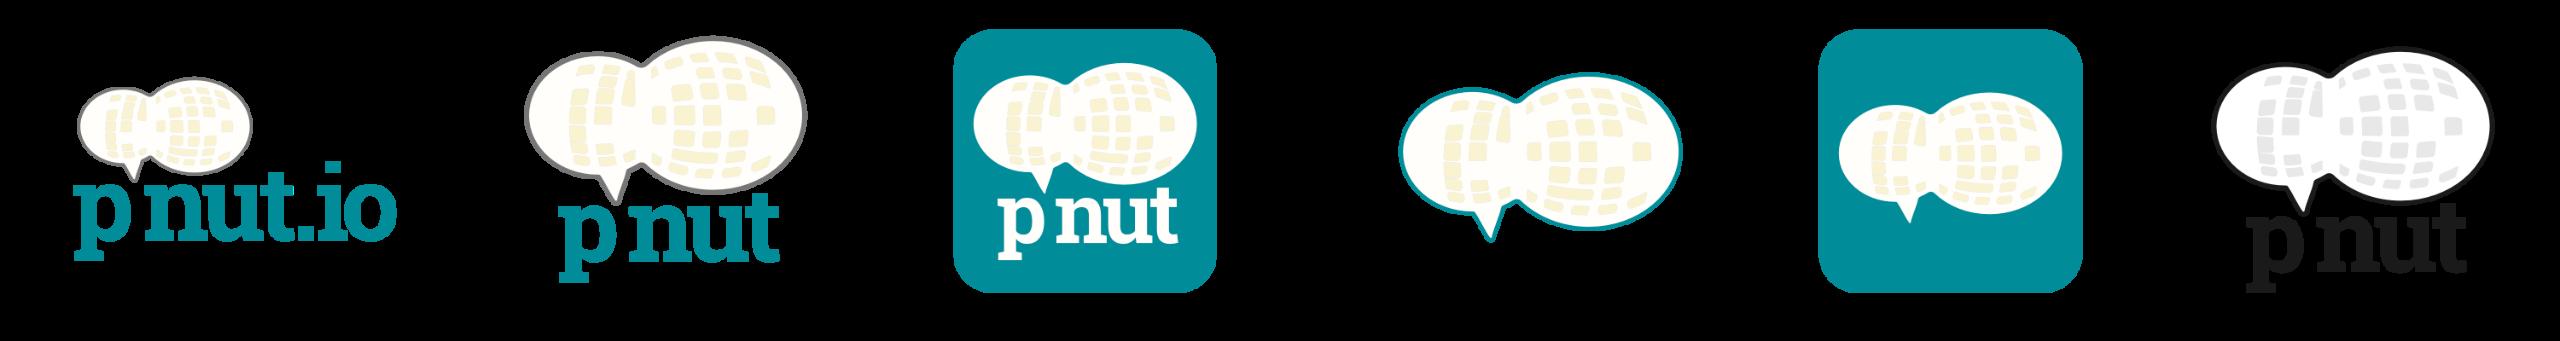 pnut logo